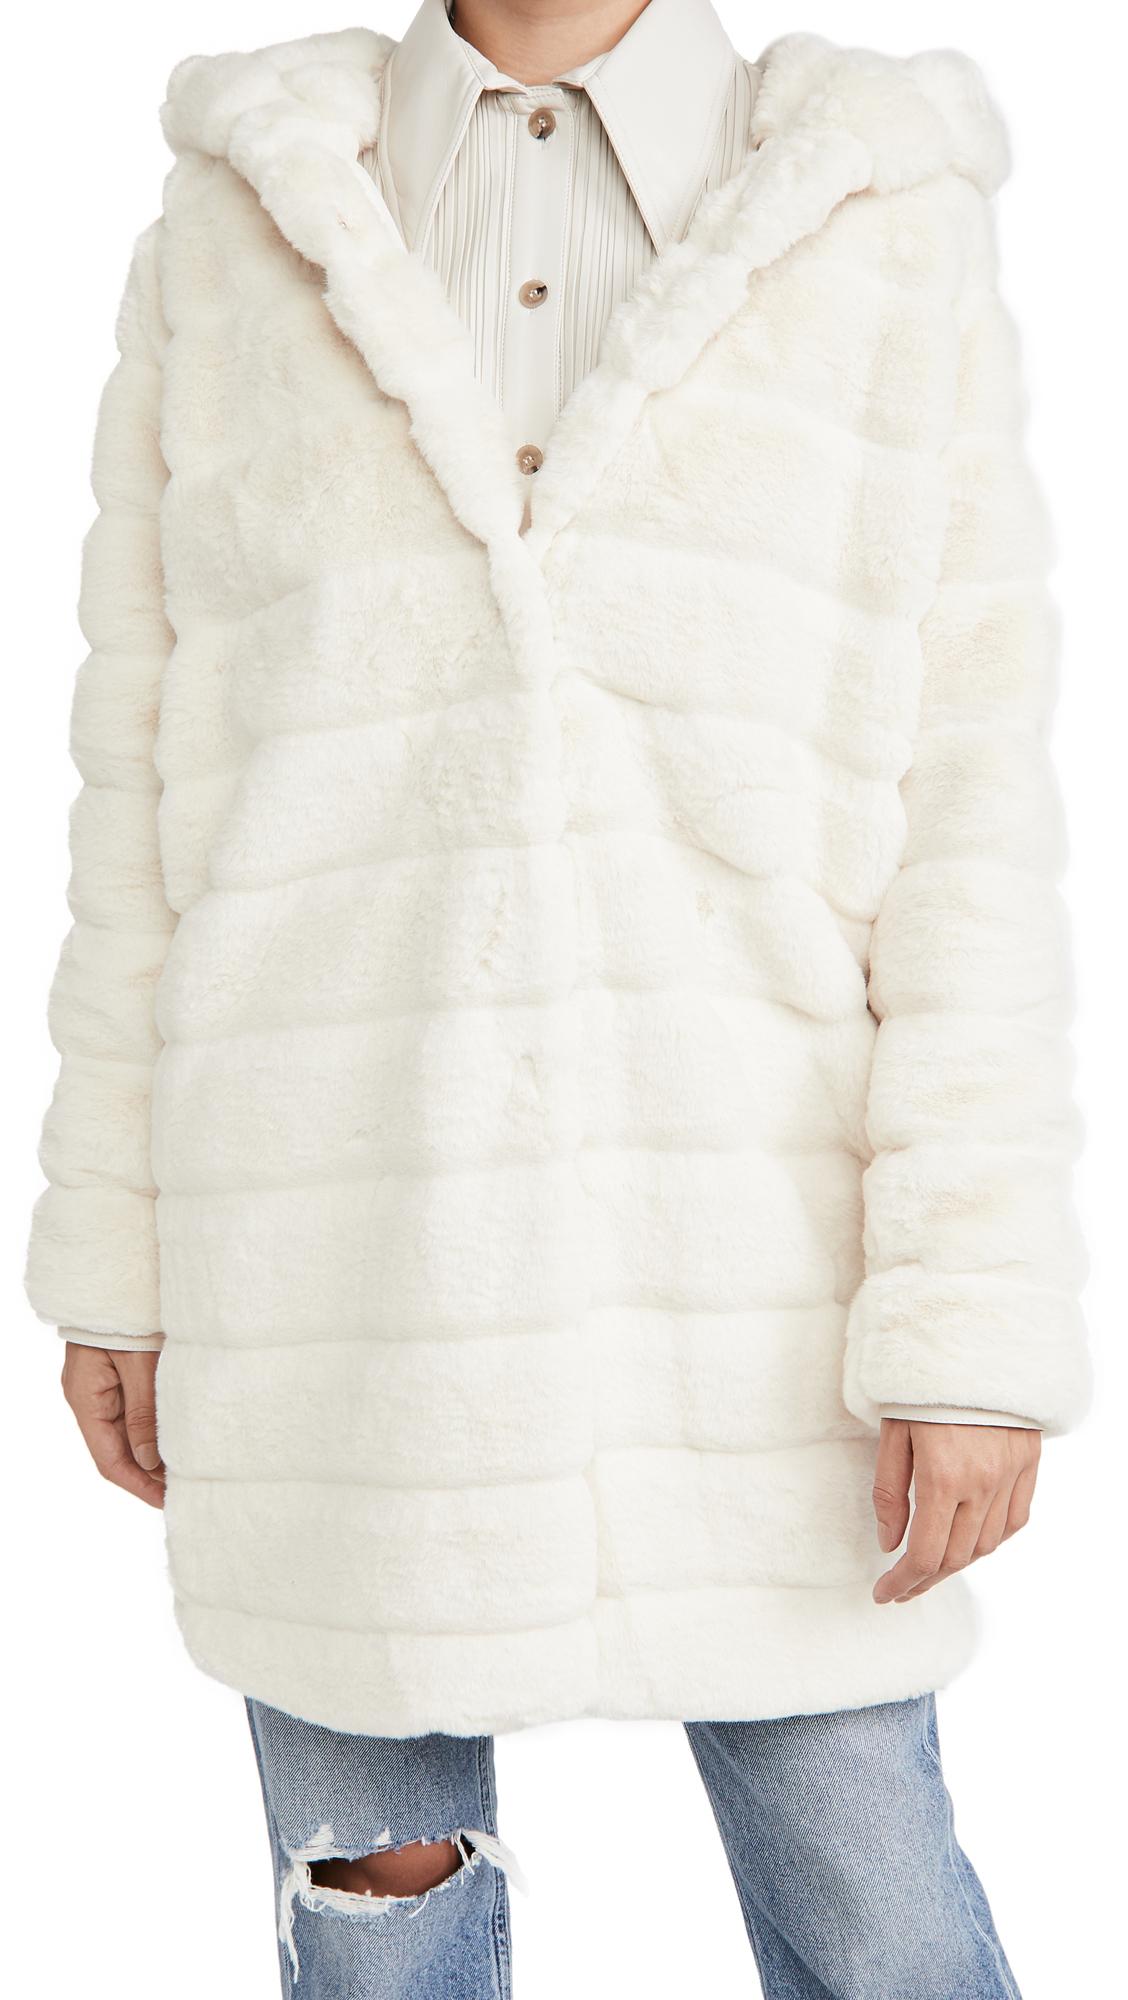 Apparis Celina Hooded Coat